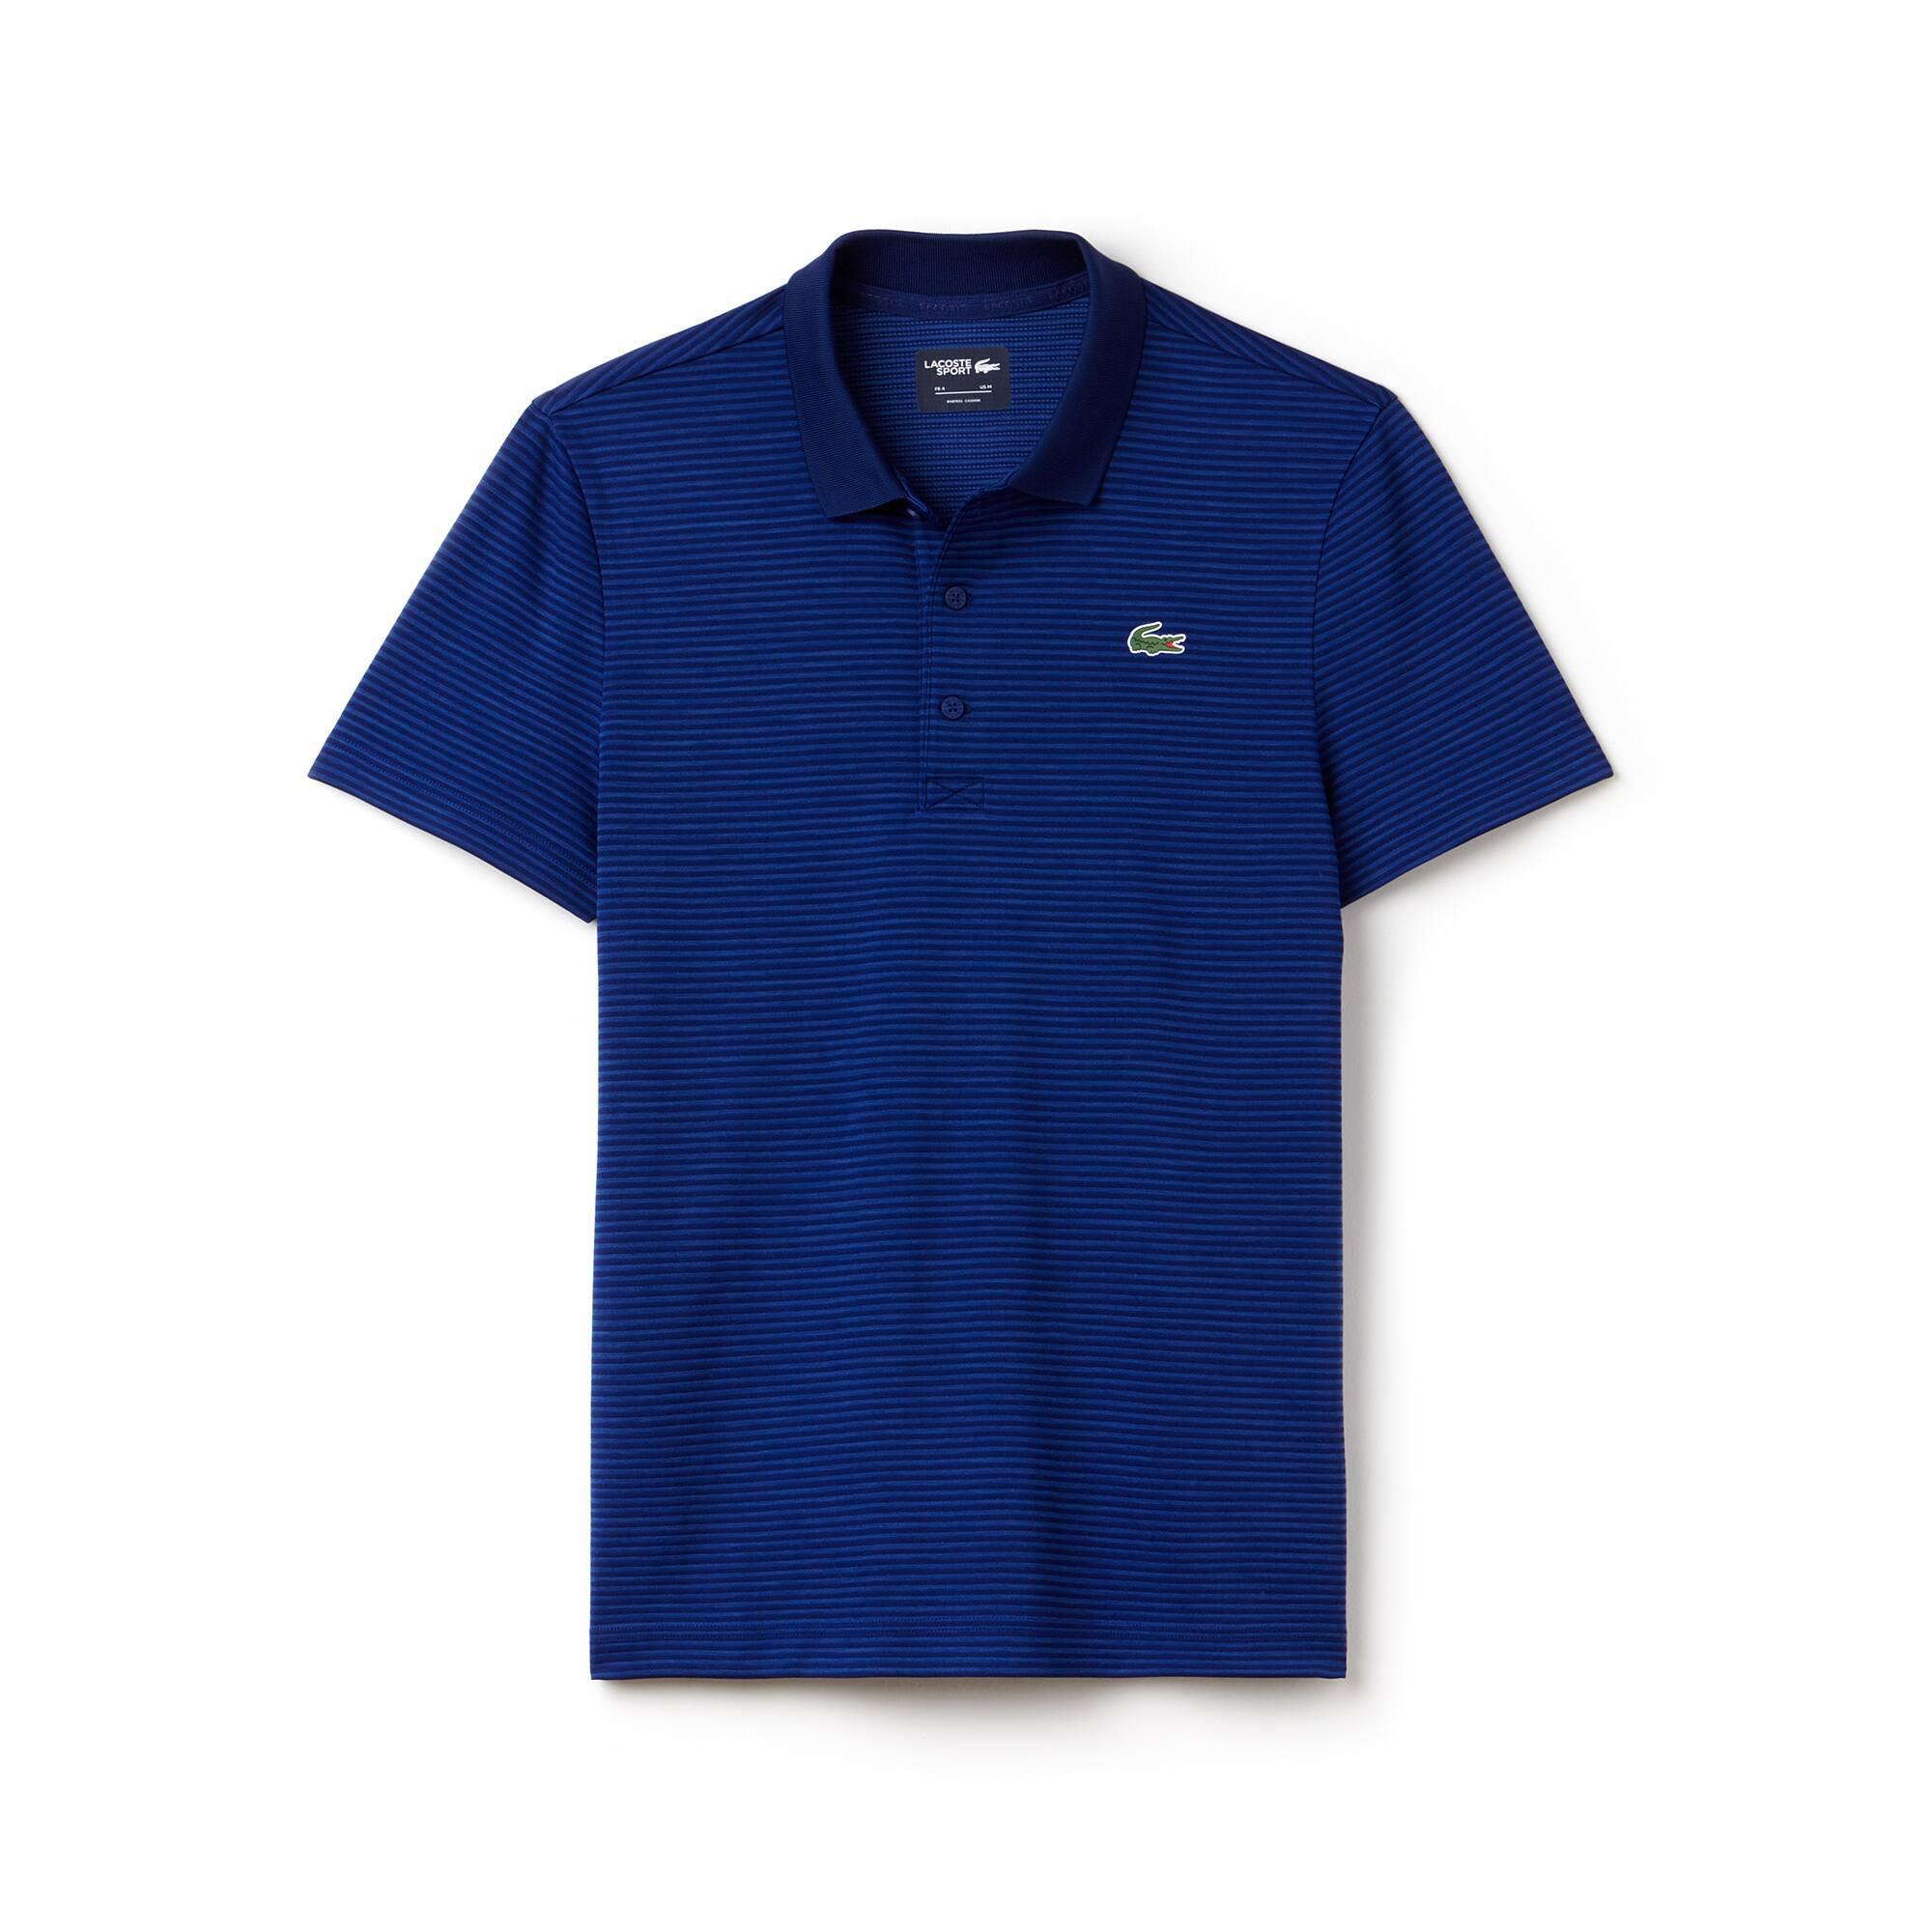 Polo Golf Lacoste SPORT en jersey technique rayé